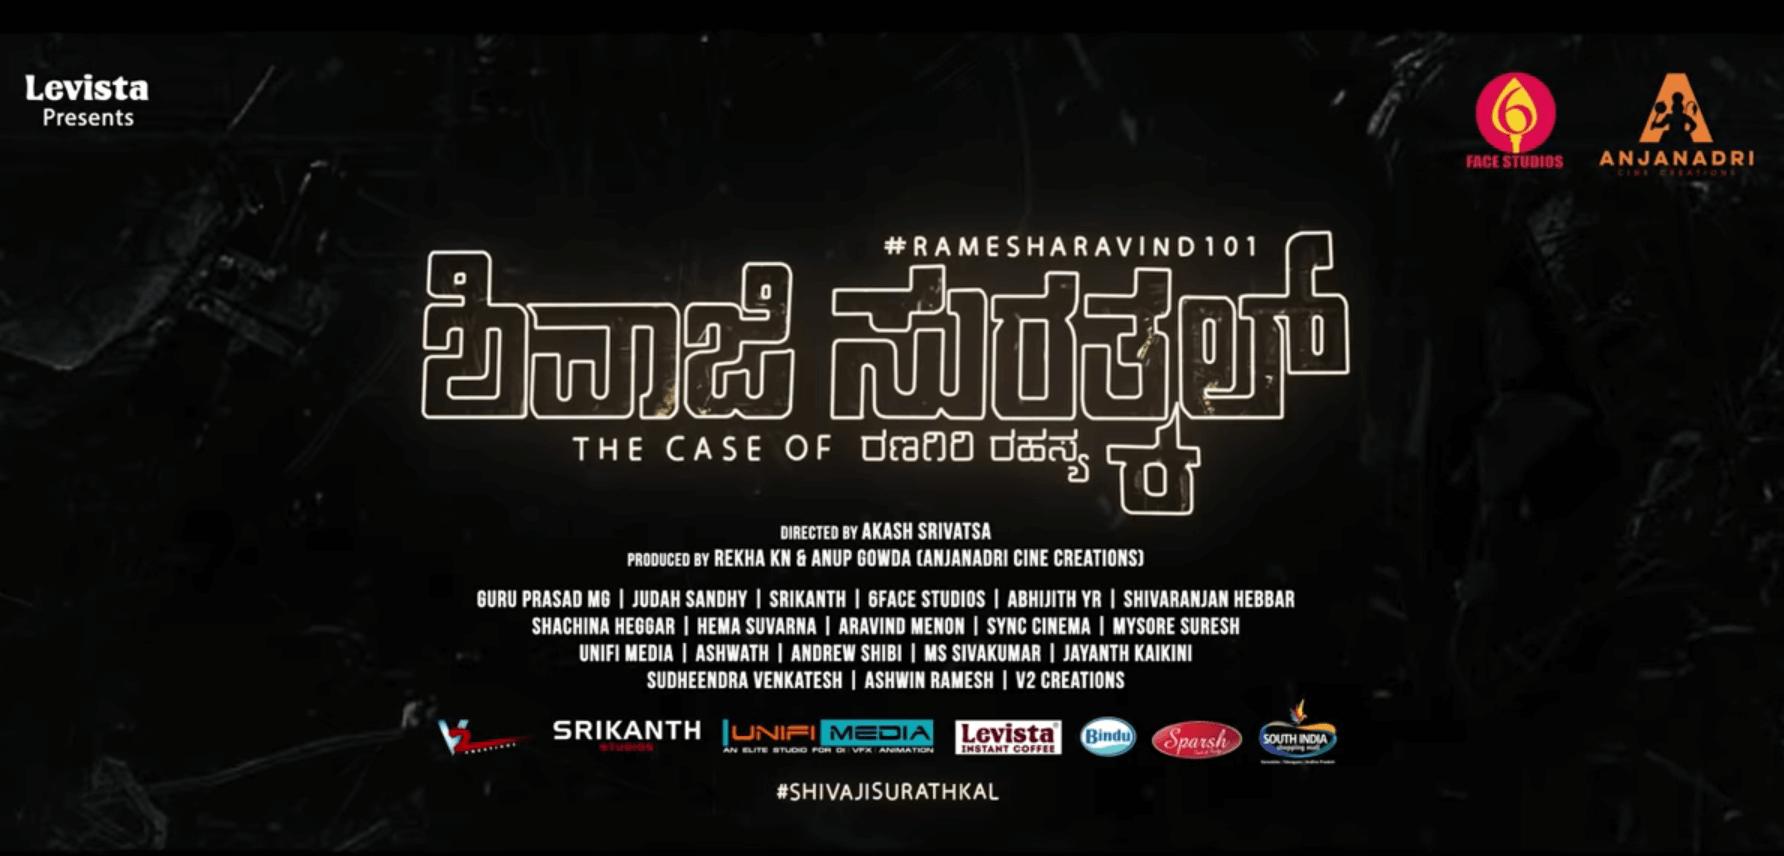 Shivaji Surathkal Kananda Movie